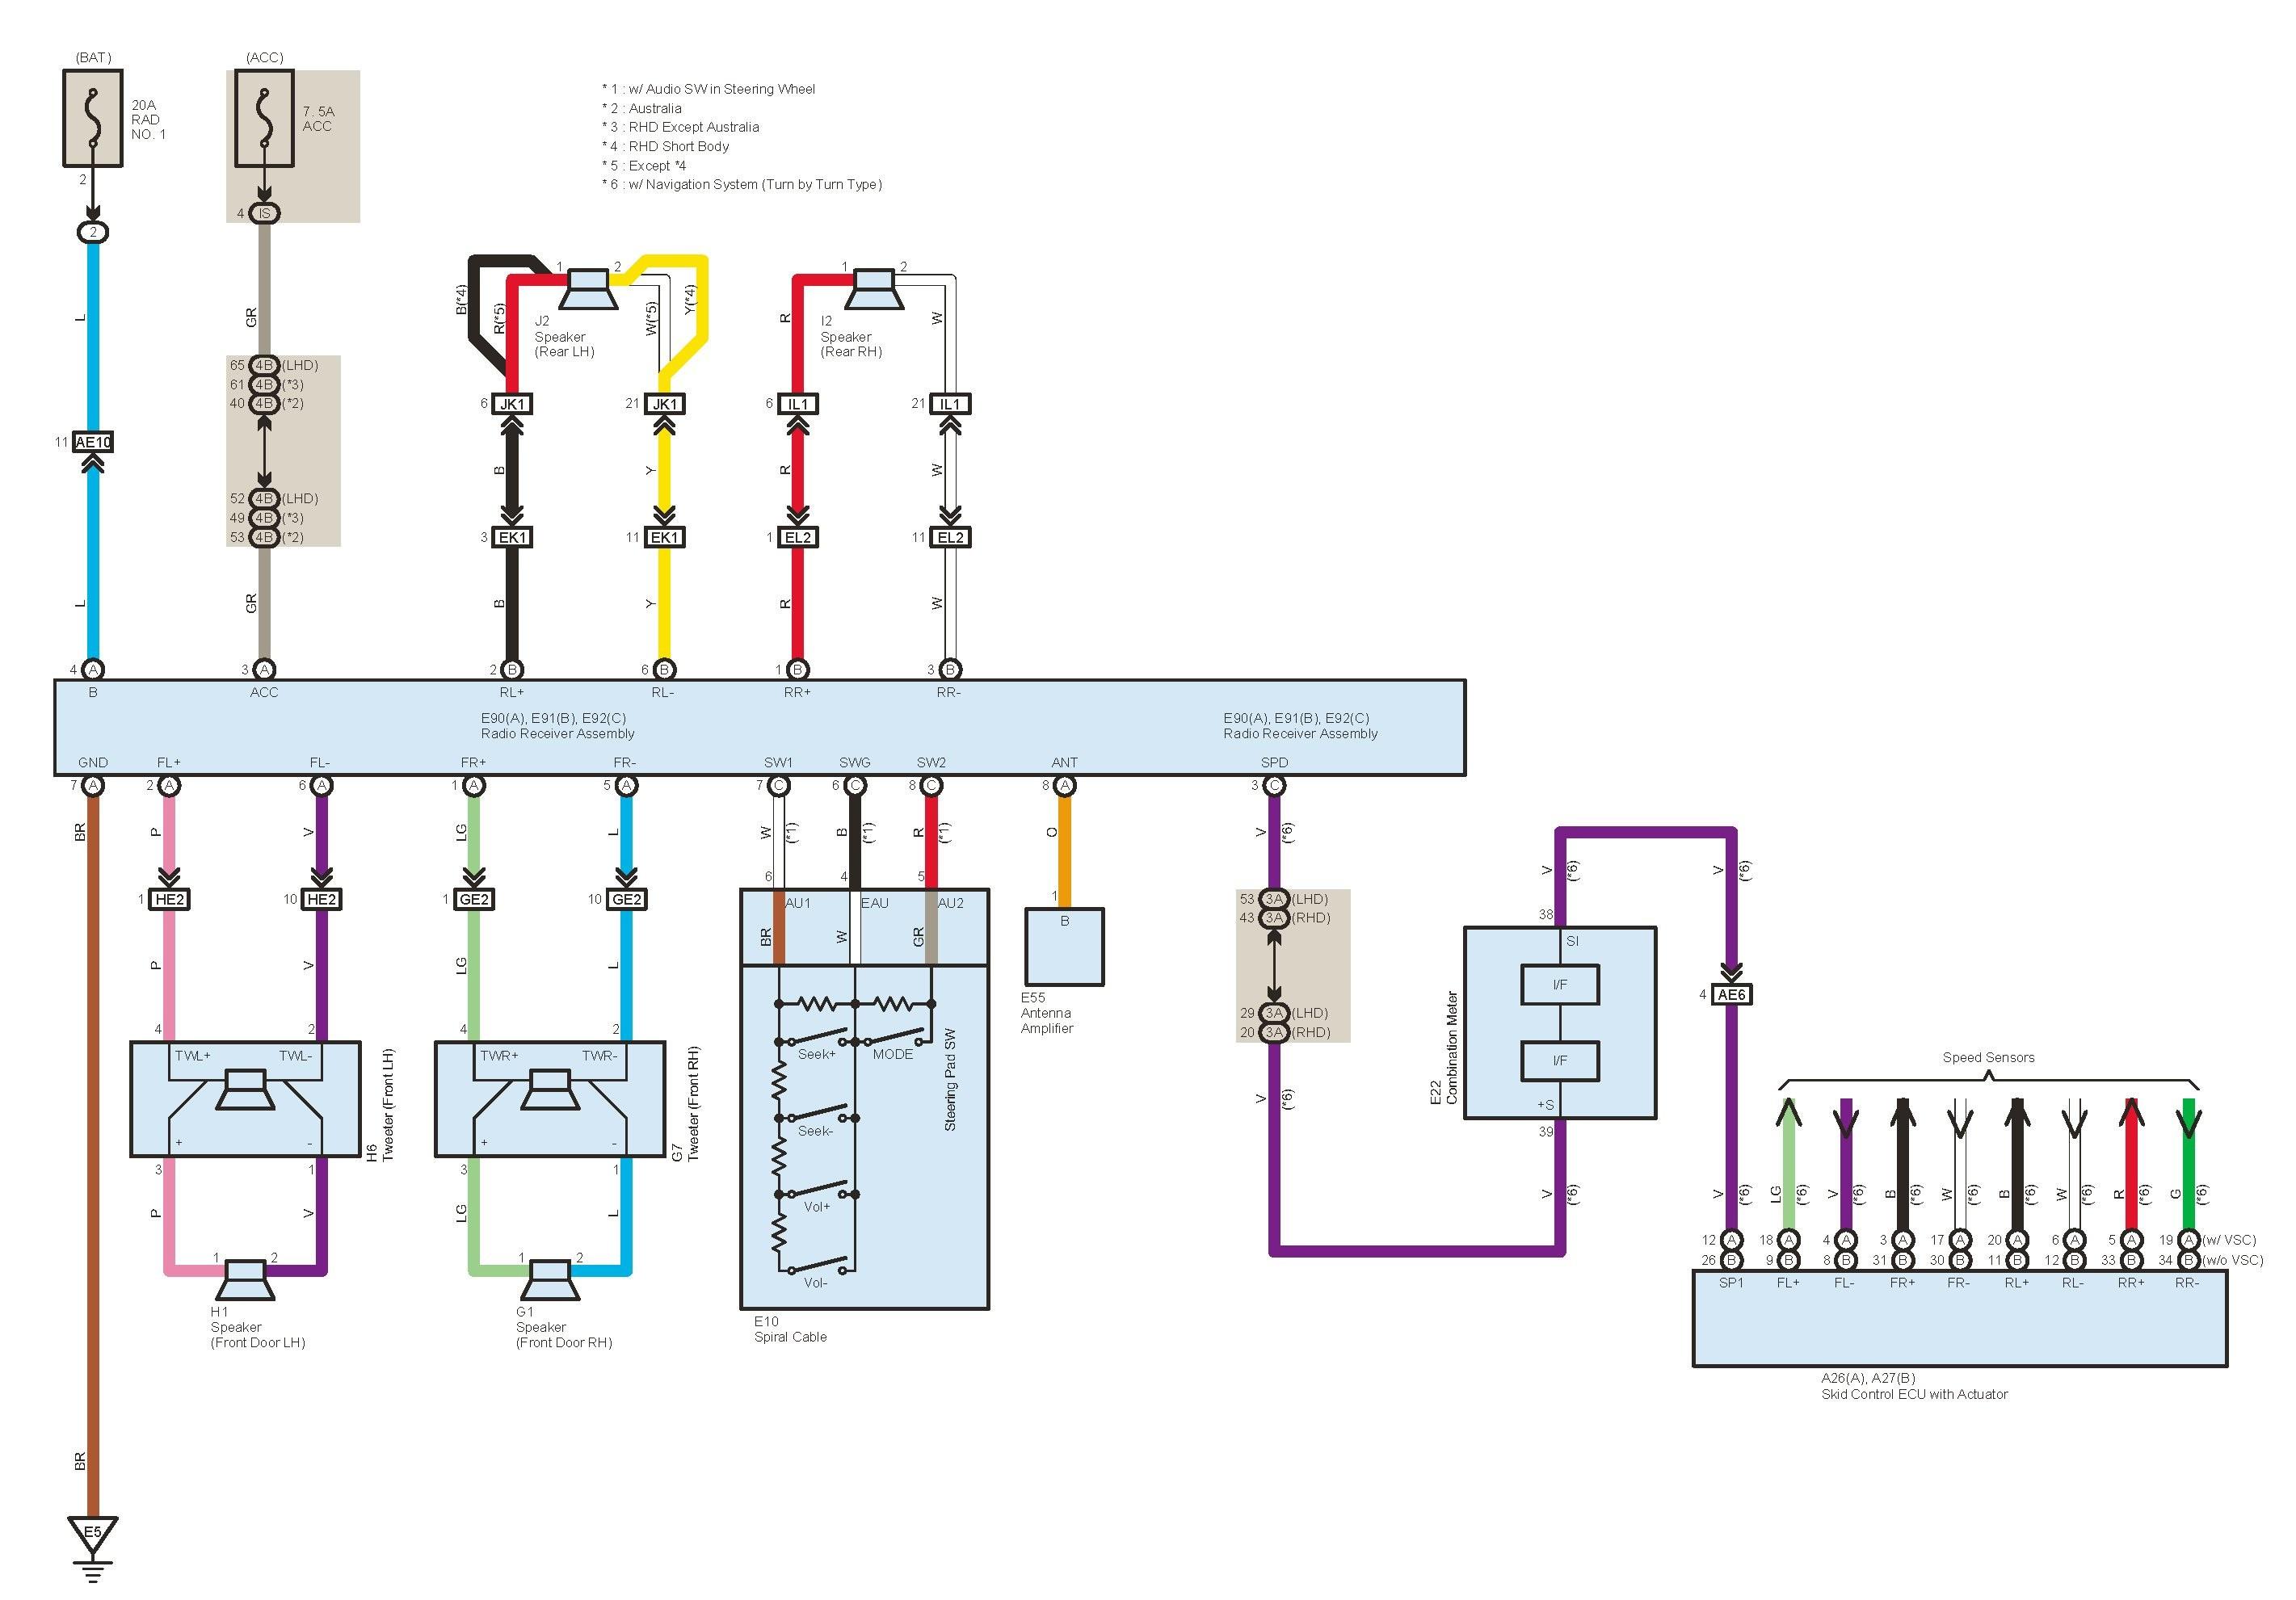 2000 toyota Tundra Parts Diagram Wiring Diagram 2001 Echo Another Blog About Wiring Diagram • Of 2000 toyota Tundra Parts Diagram